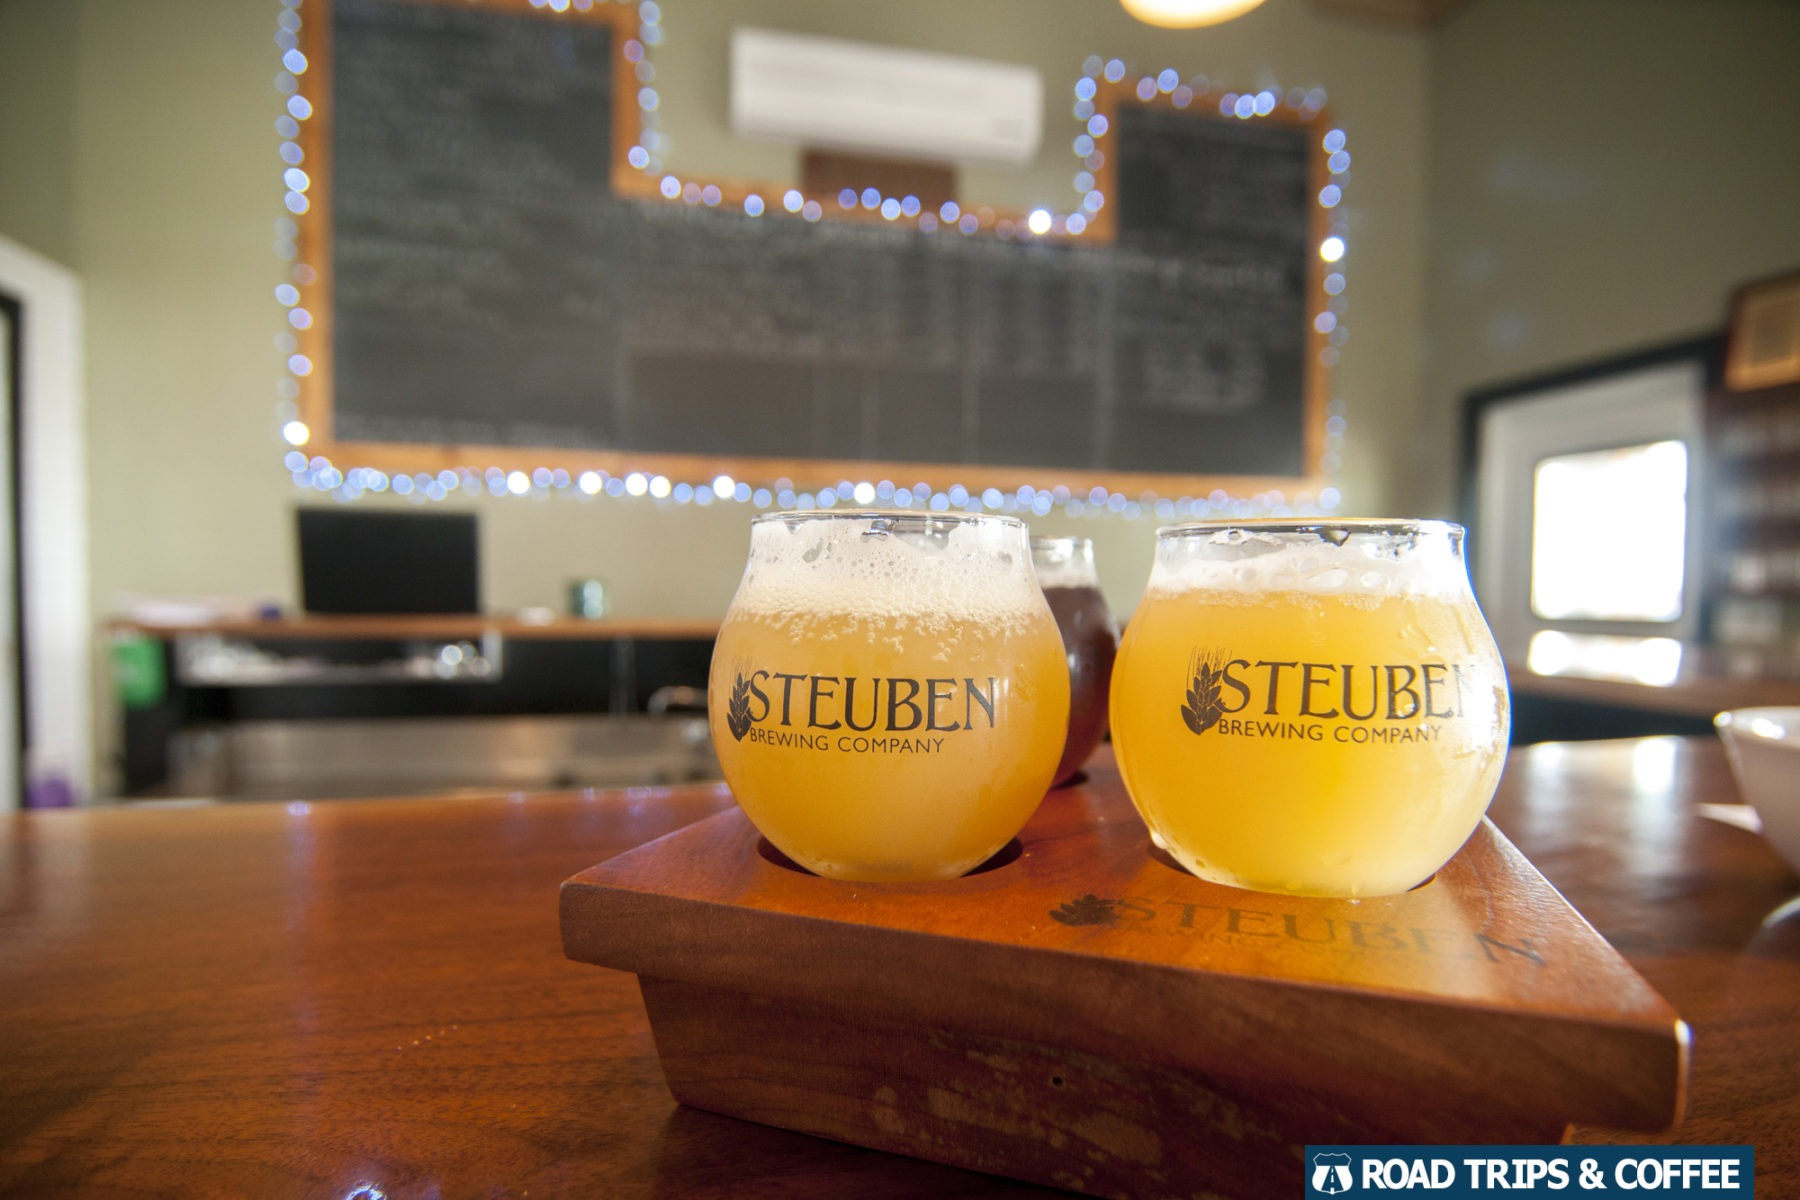 A flight of craft beer from Steuben Brewing Company in Hammondsport, New York